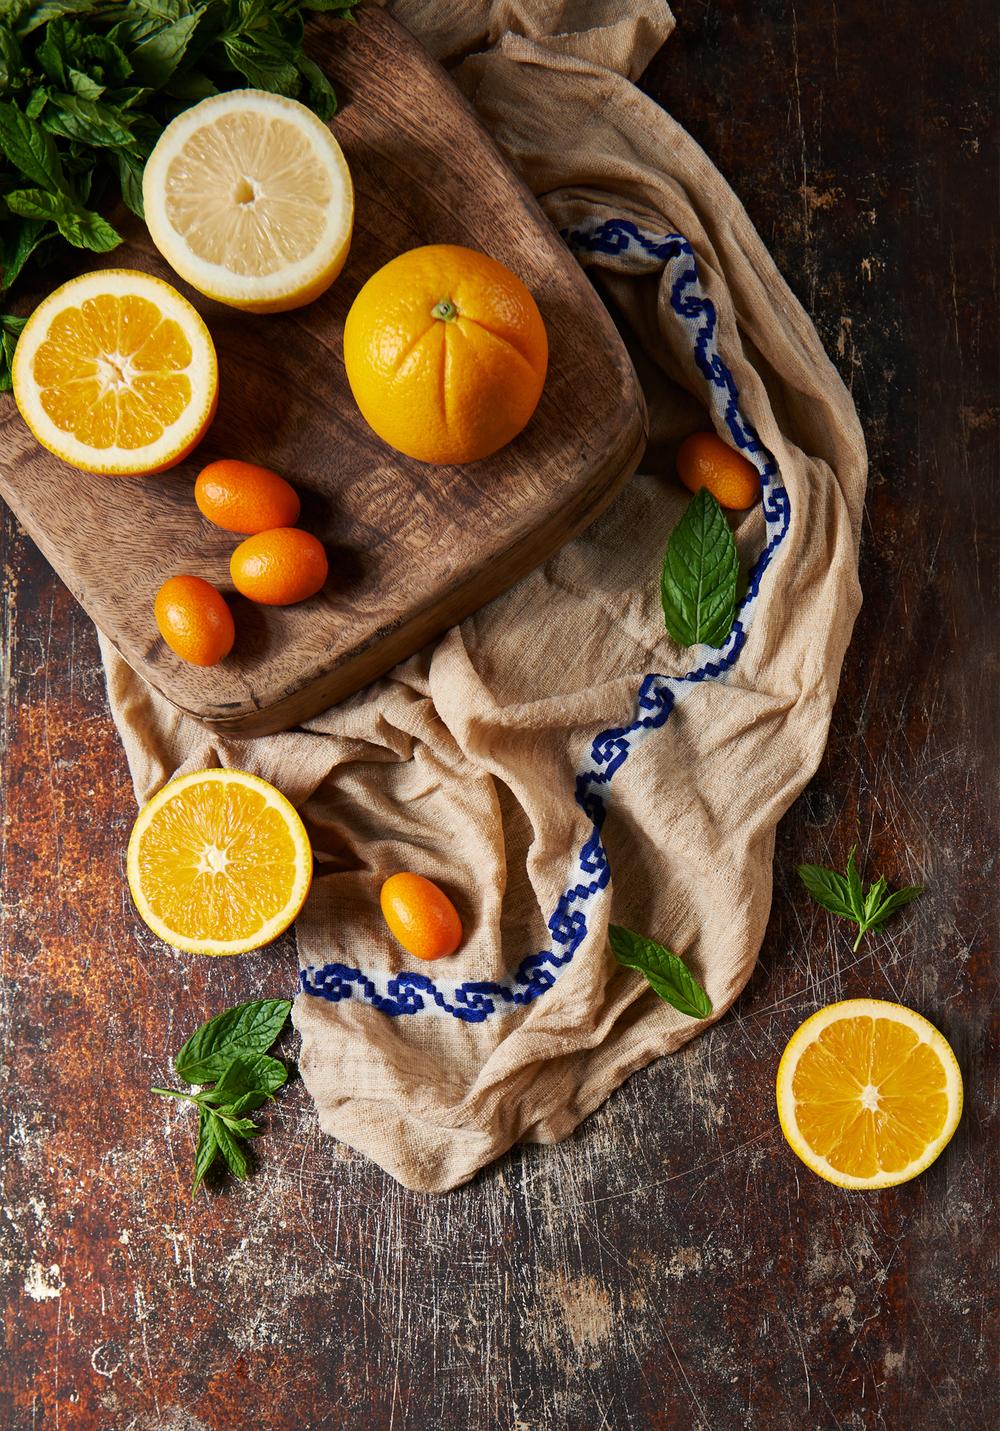 still life image of oranges and kumquats